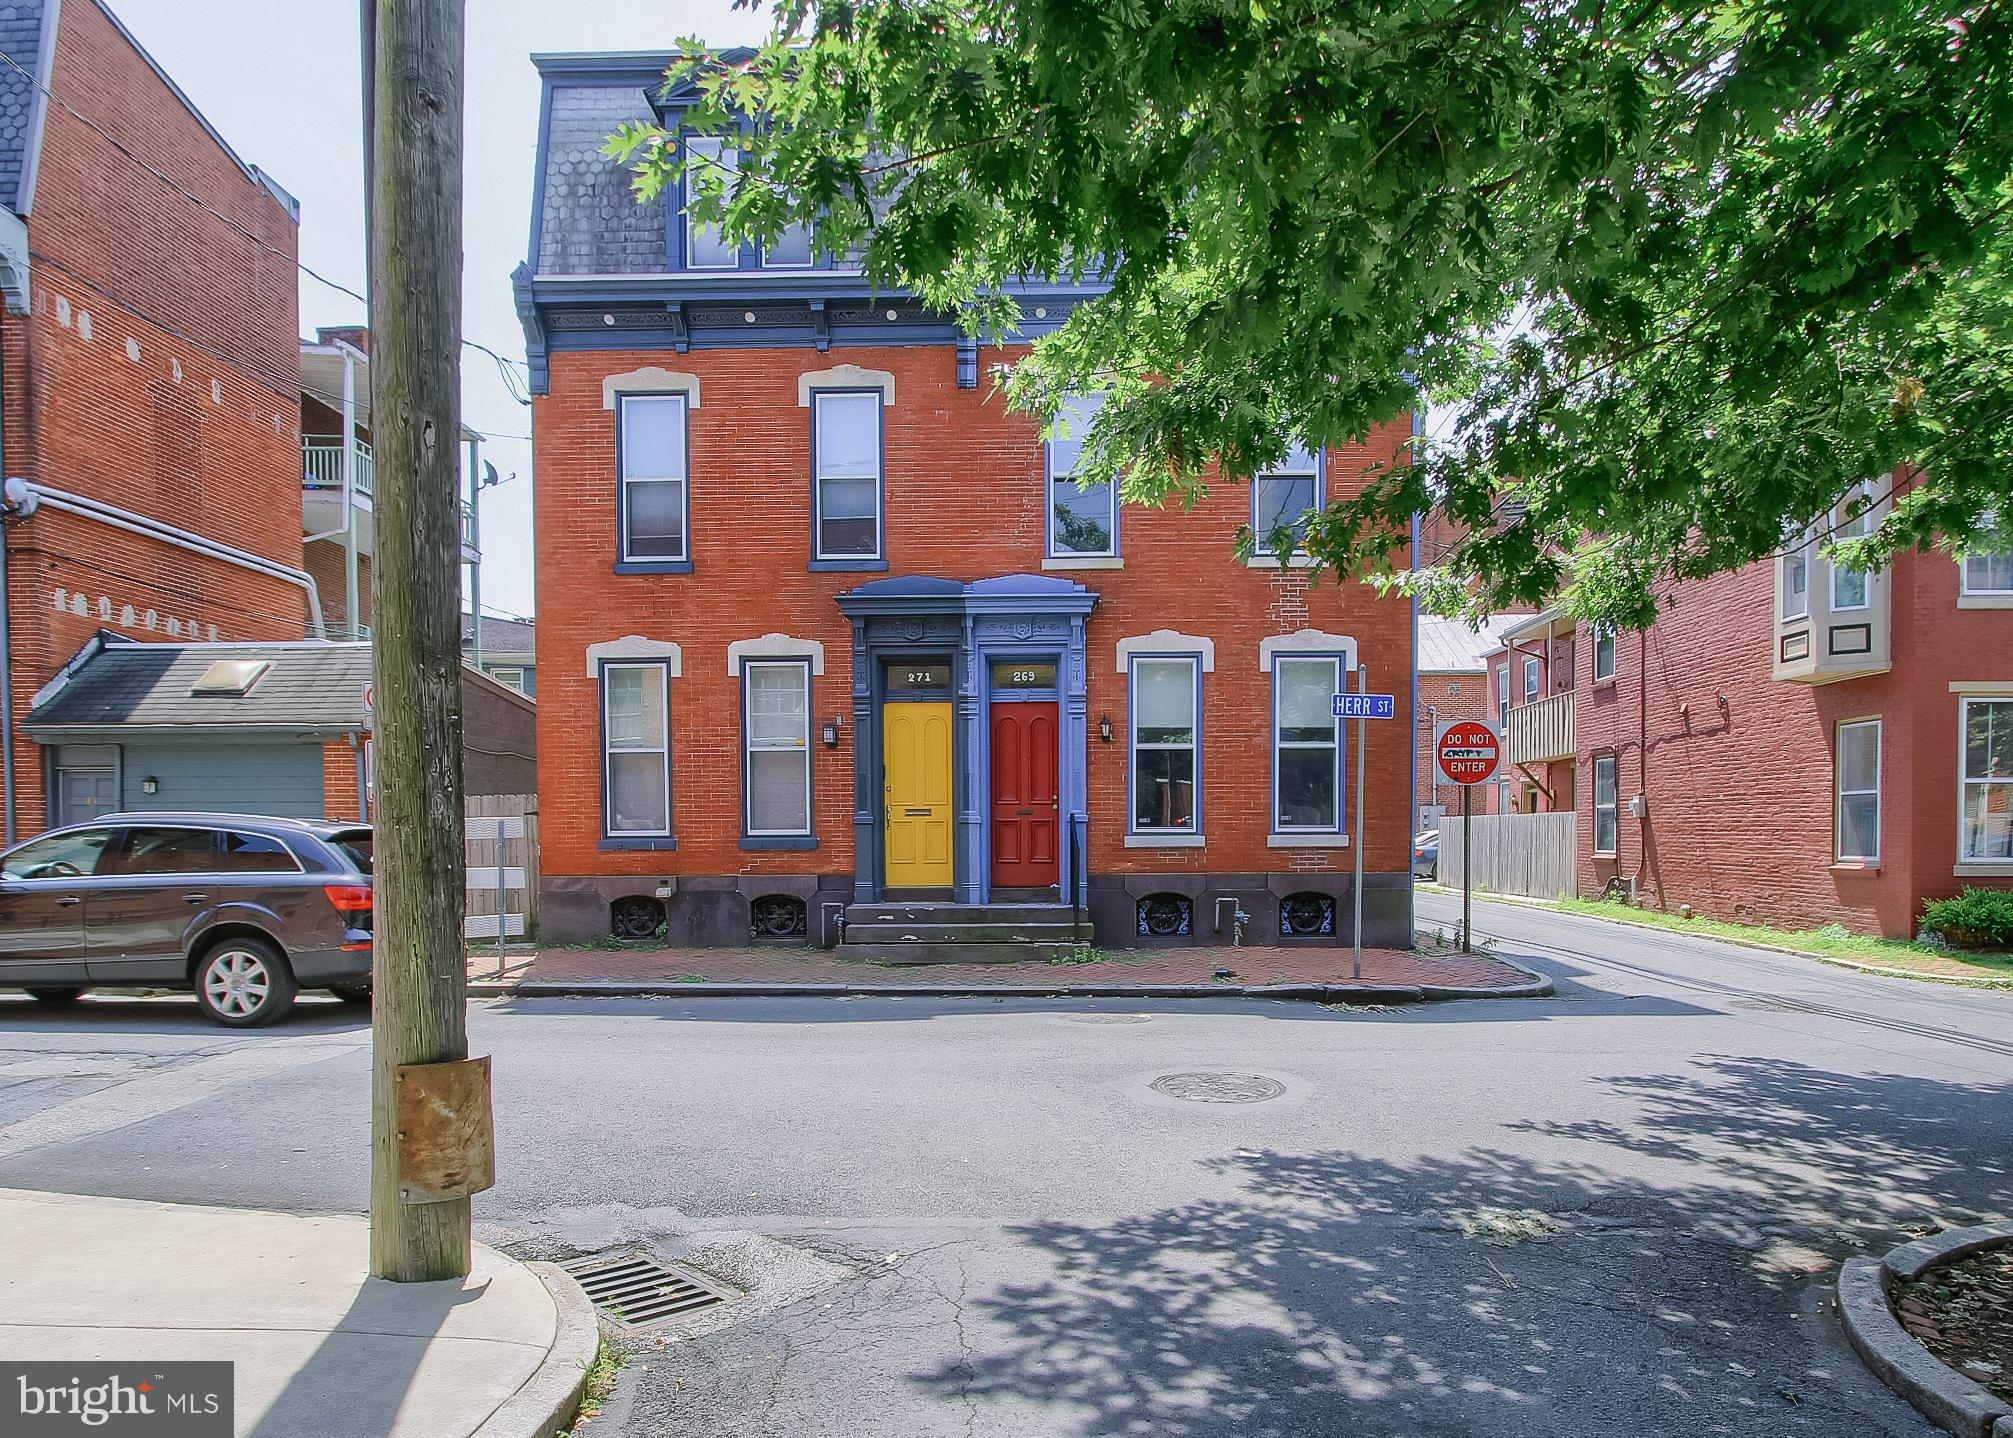 269 HERR STREET, HARRISBURG, PA 17102